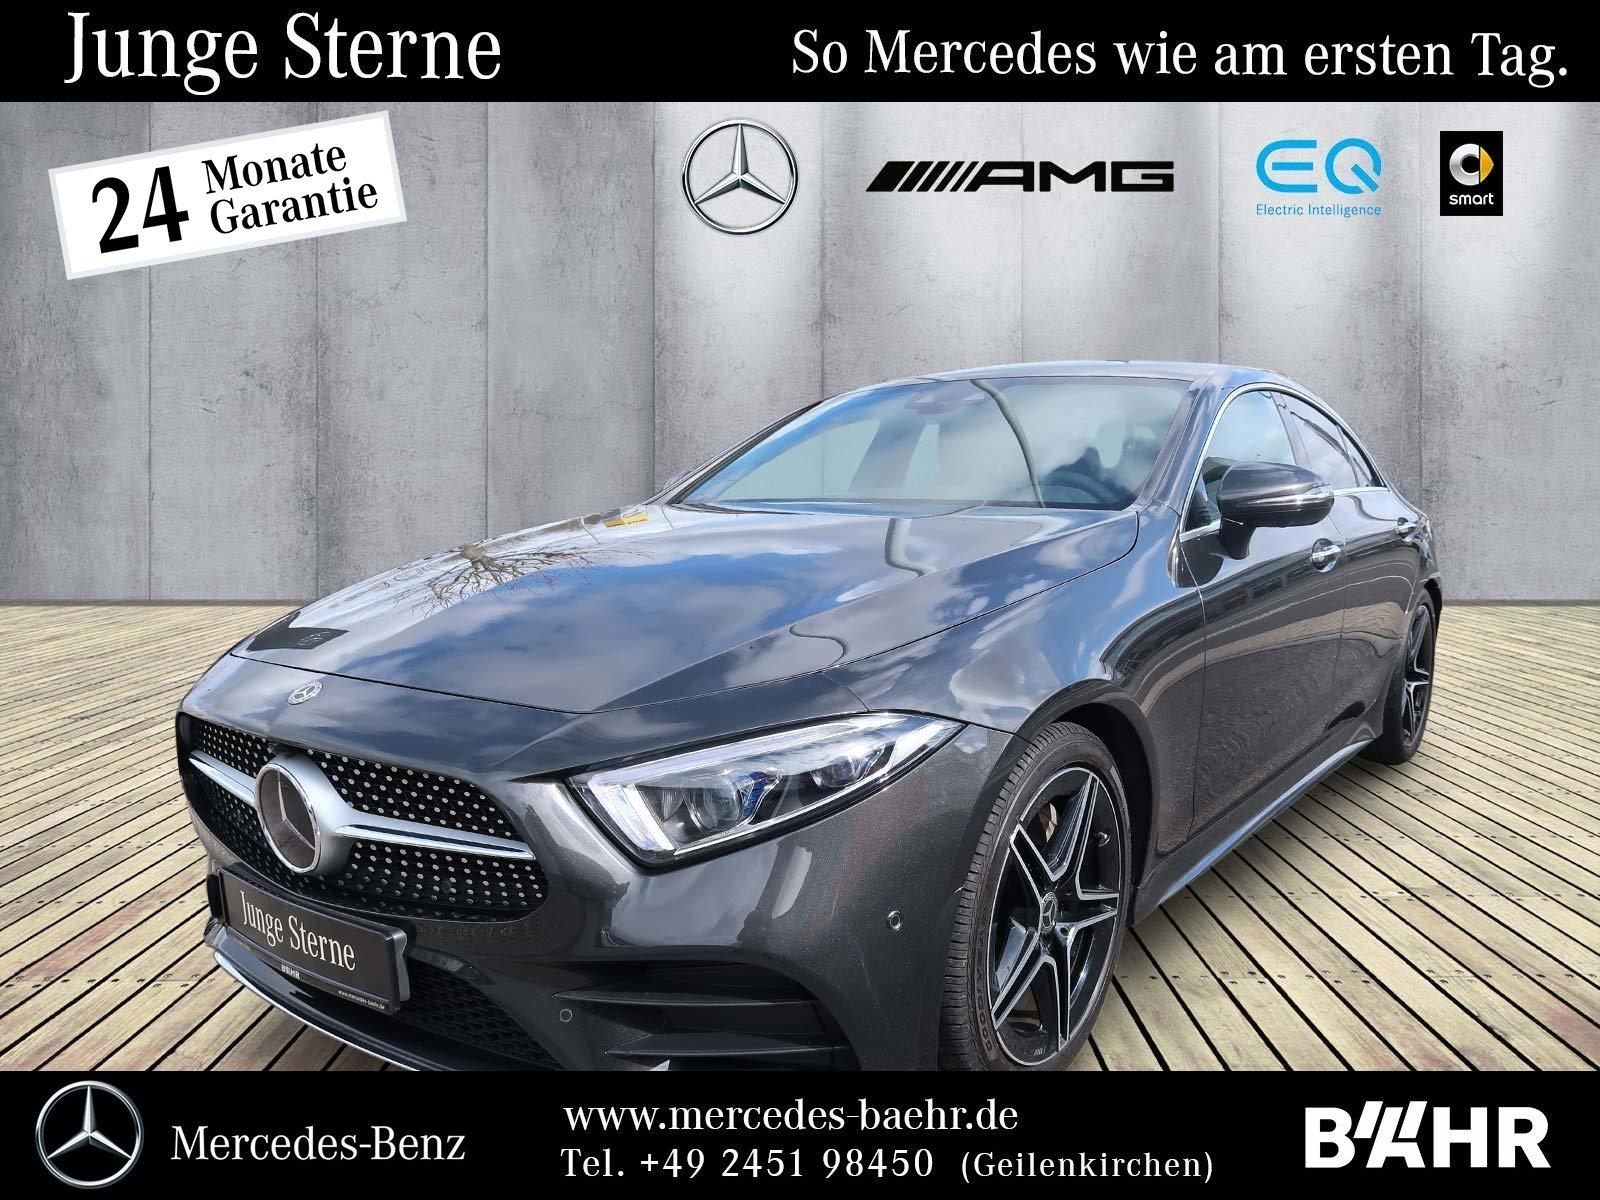 Mercedes-Benz CLS 400 d 4M AMG/Comand/Multibeam/360°/Burmester, Jahr 2018, Diesel